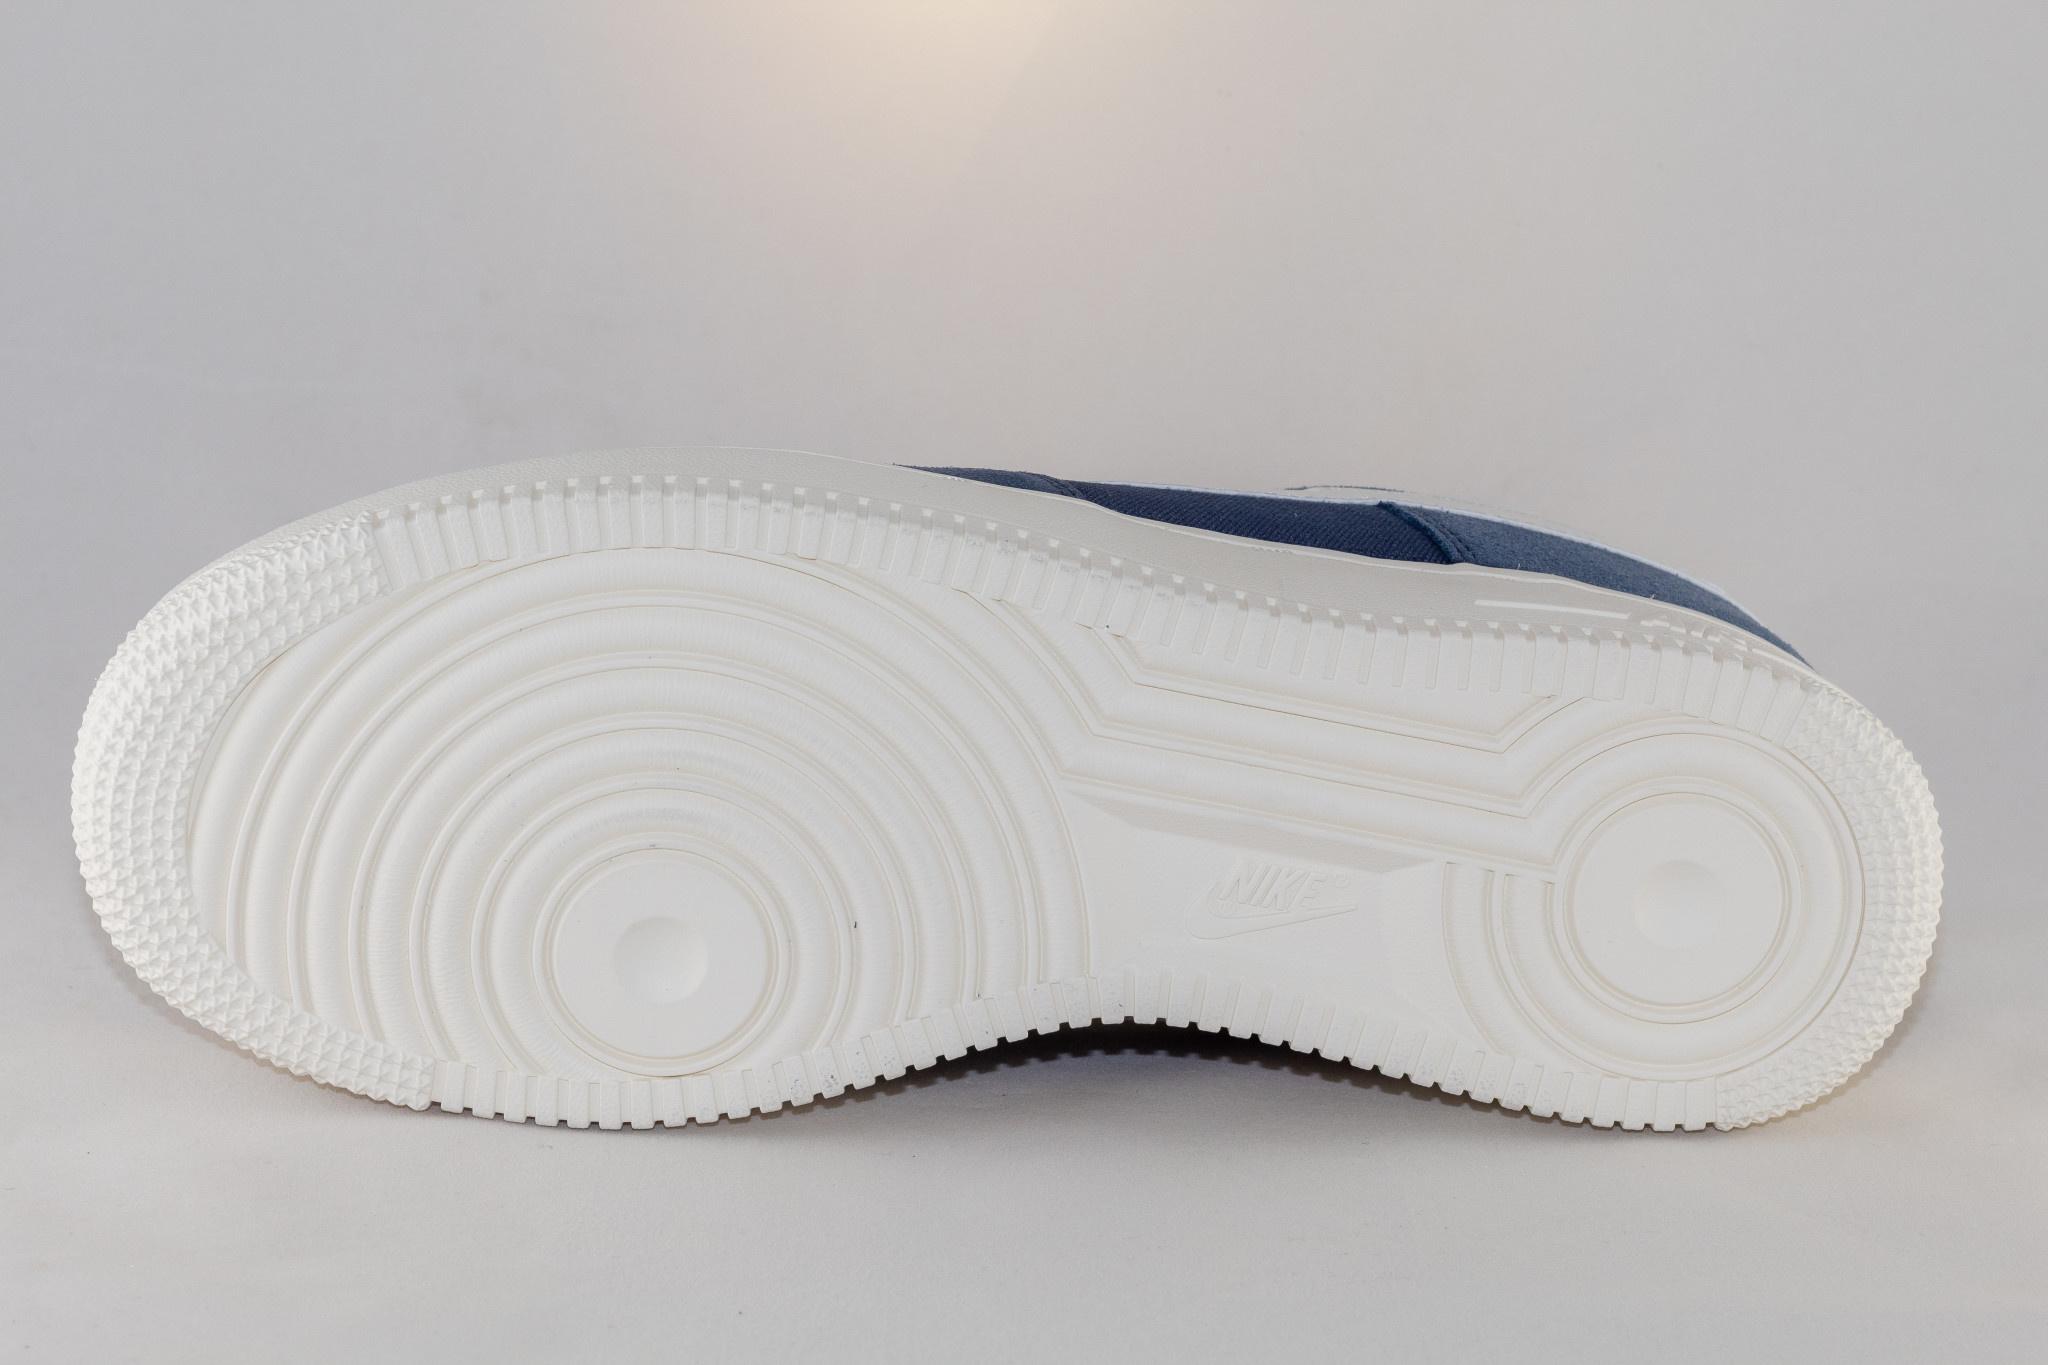 Nike NIKE AIR FORCE 1 '07 2 Monsoon Blue/ Sail